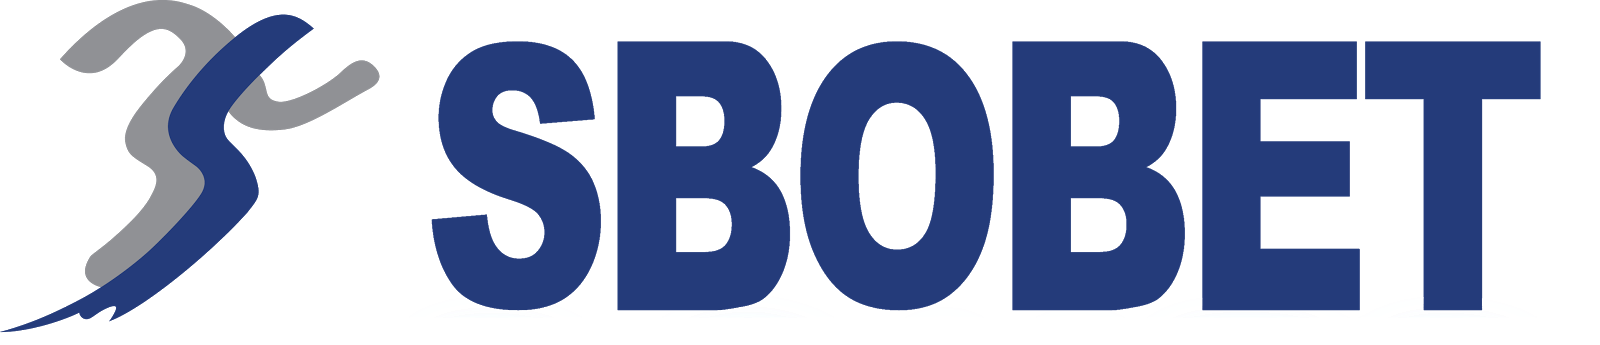 Agen SBOBET Bola Online